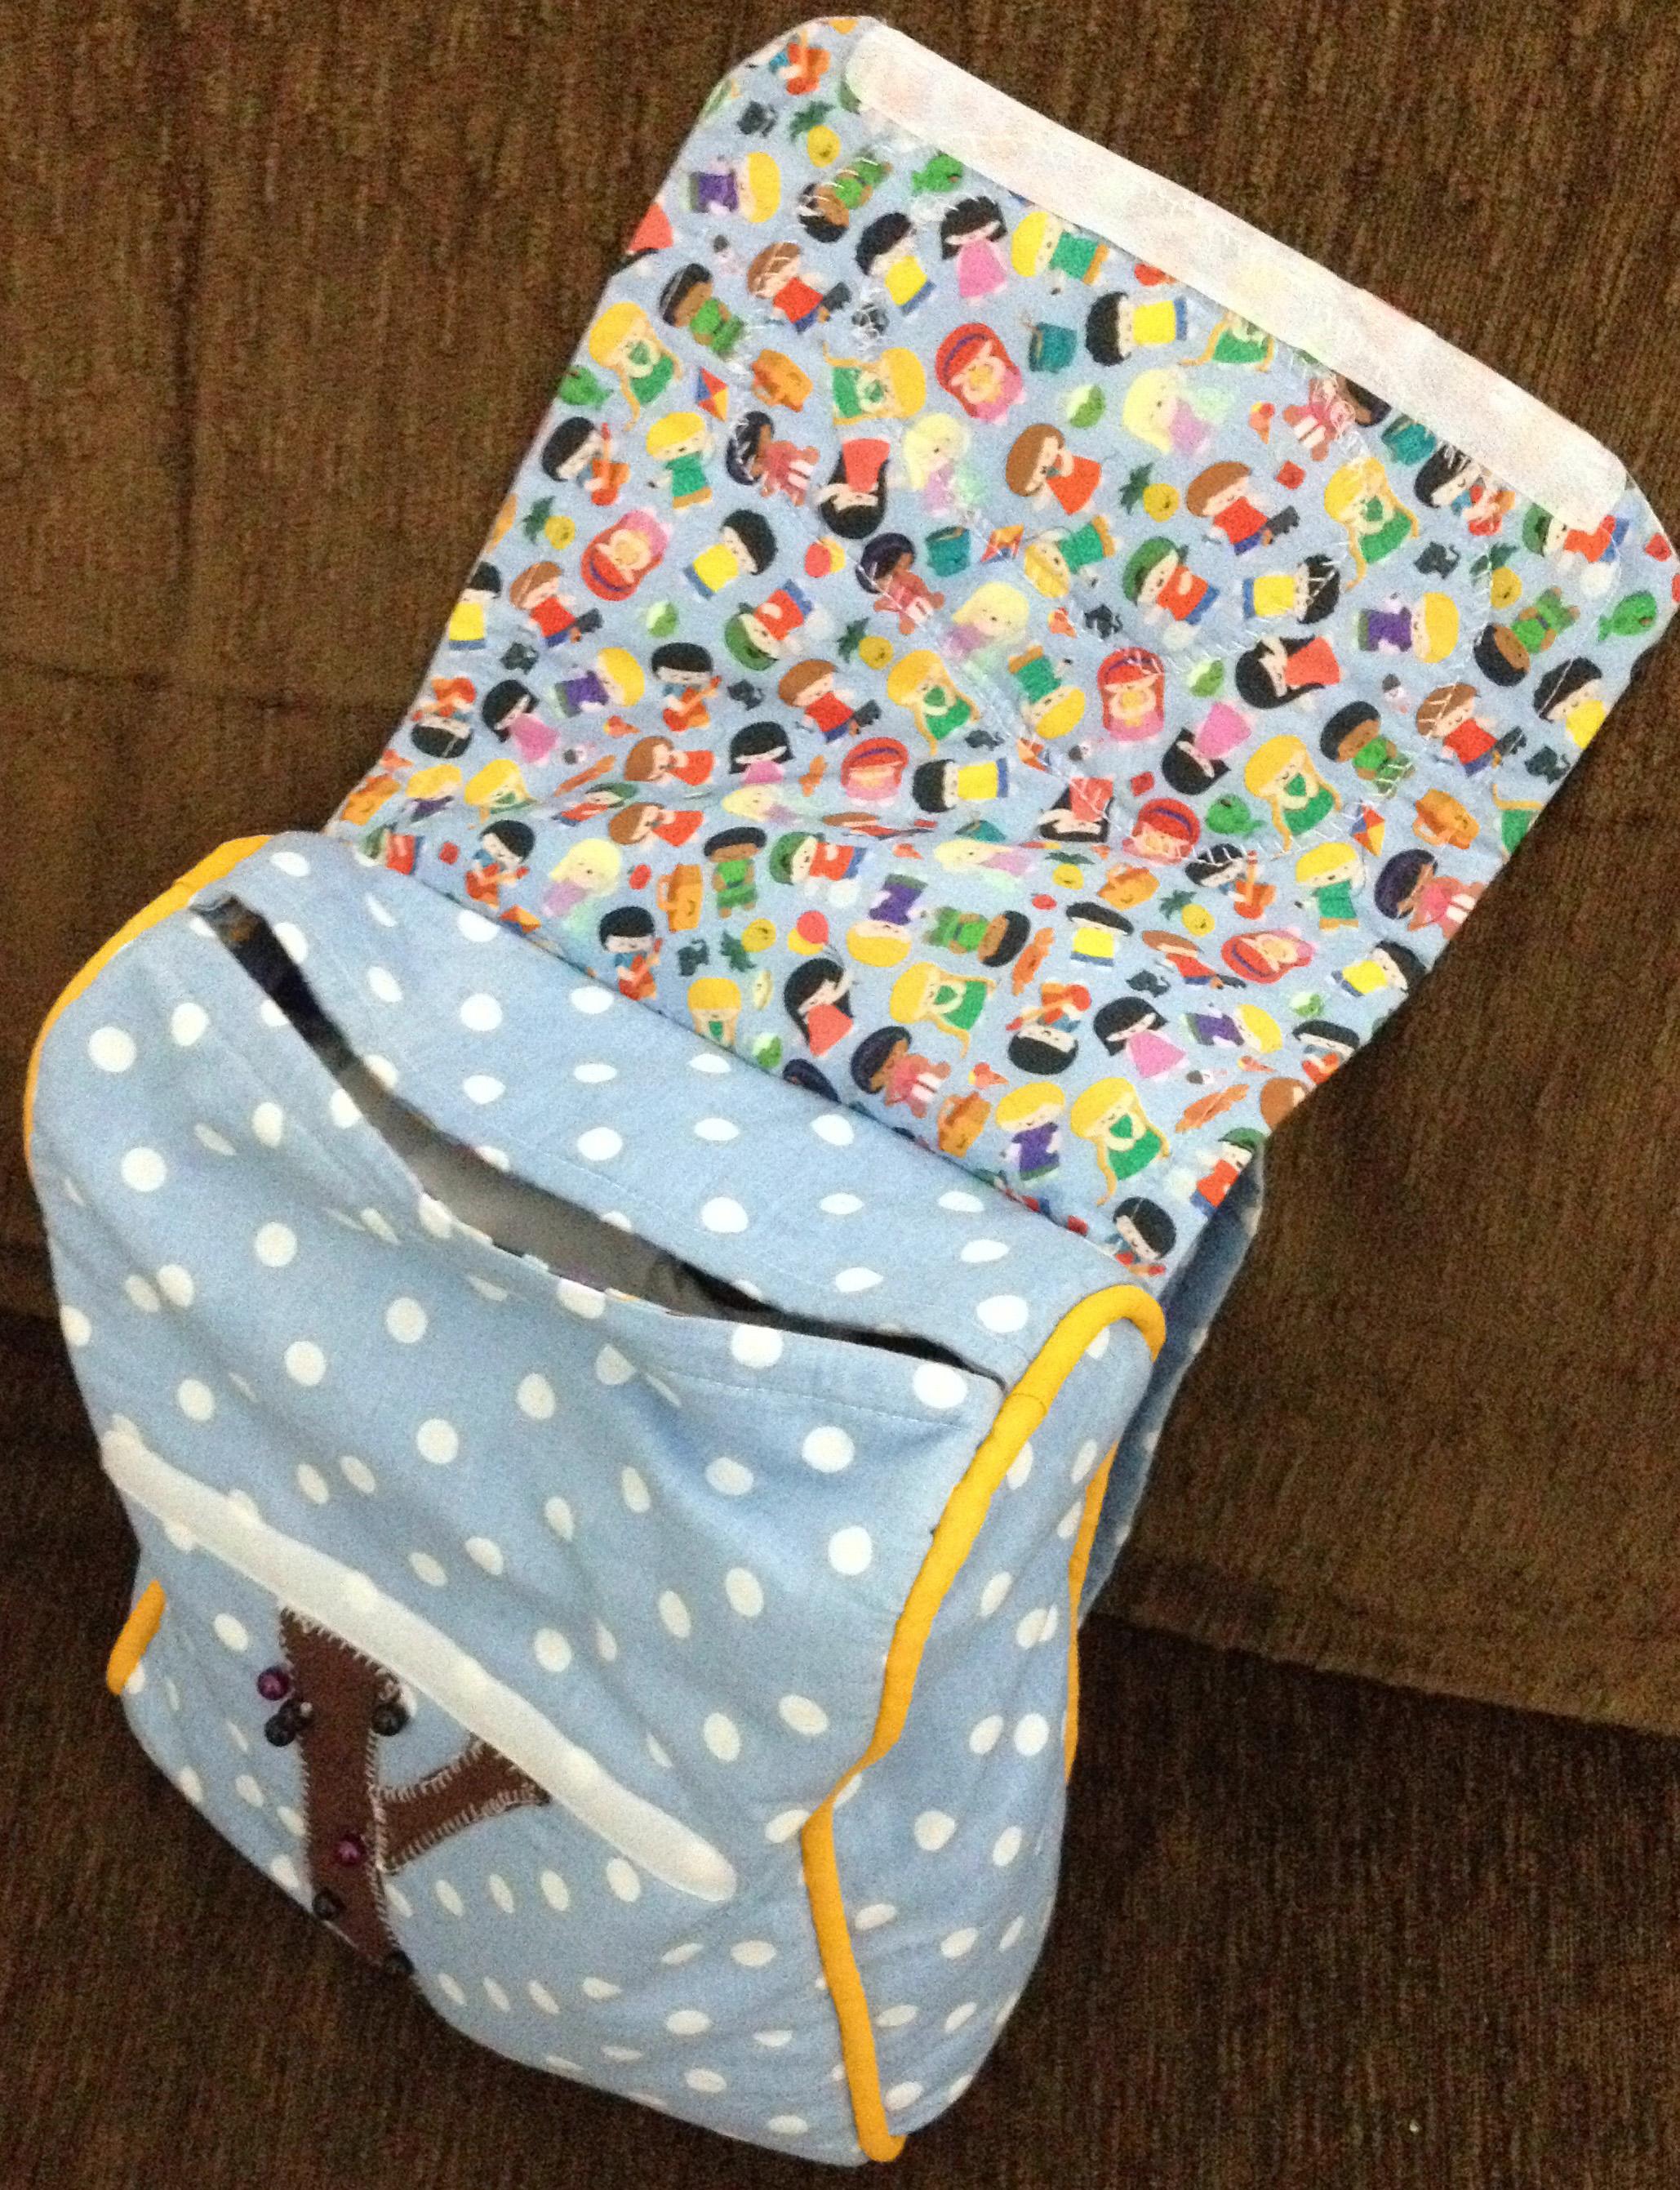 Bolsa De Tecido Redonda : Mochila infantil jabuticaba guapuru elo